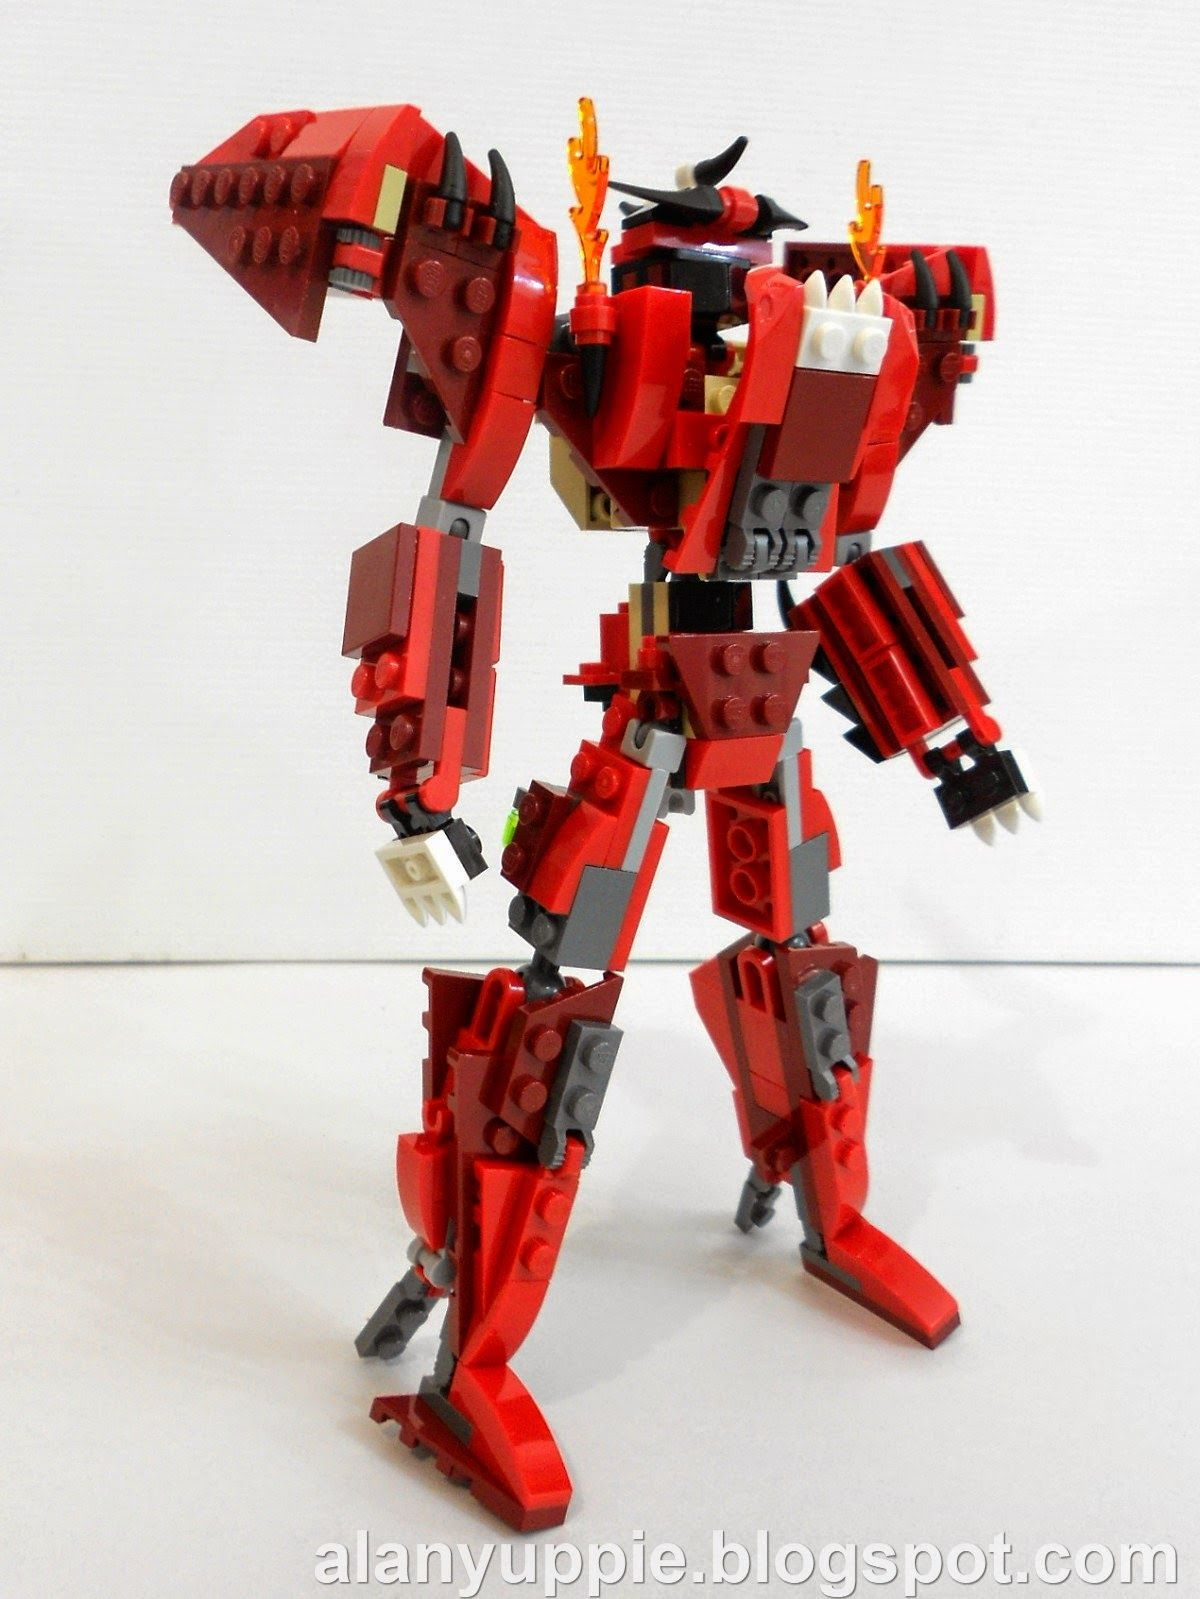 Alanyuppies Lego Transformers Lego 31032 Alternate Mode Infernus